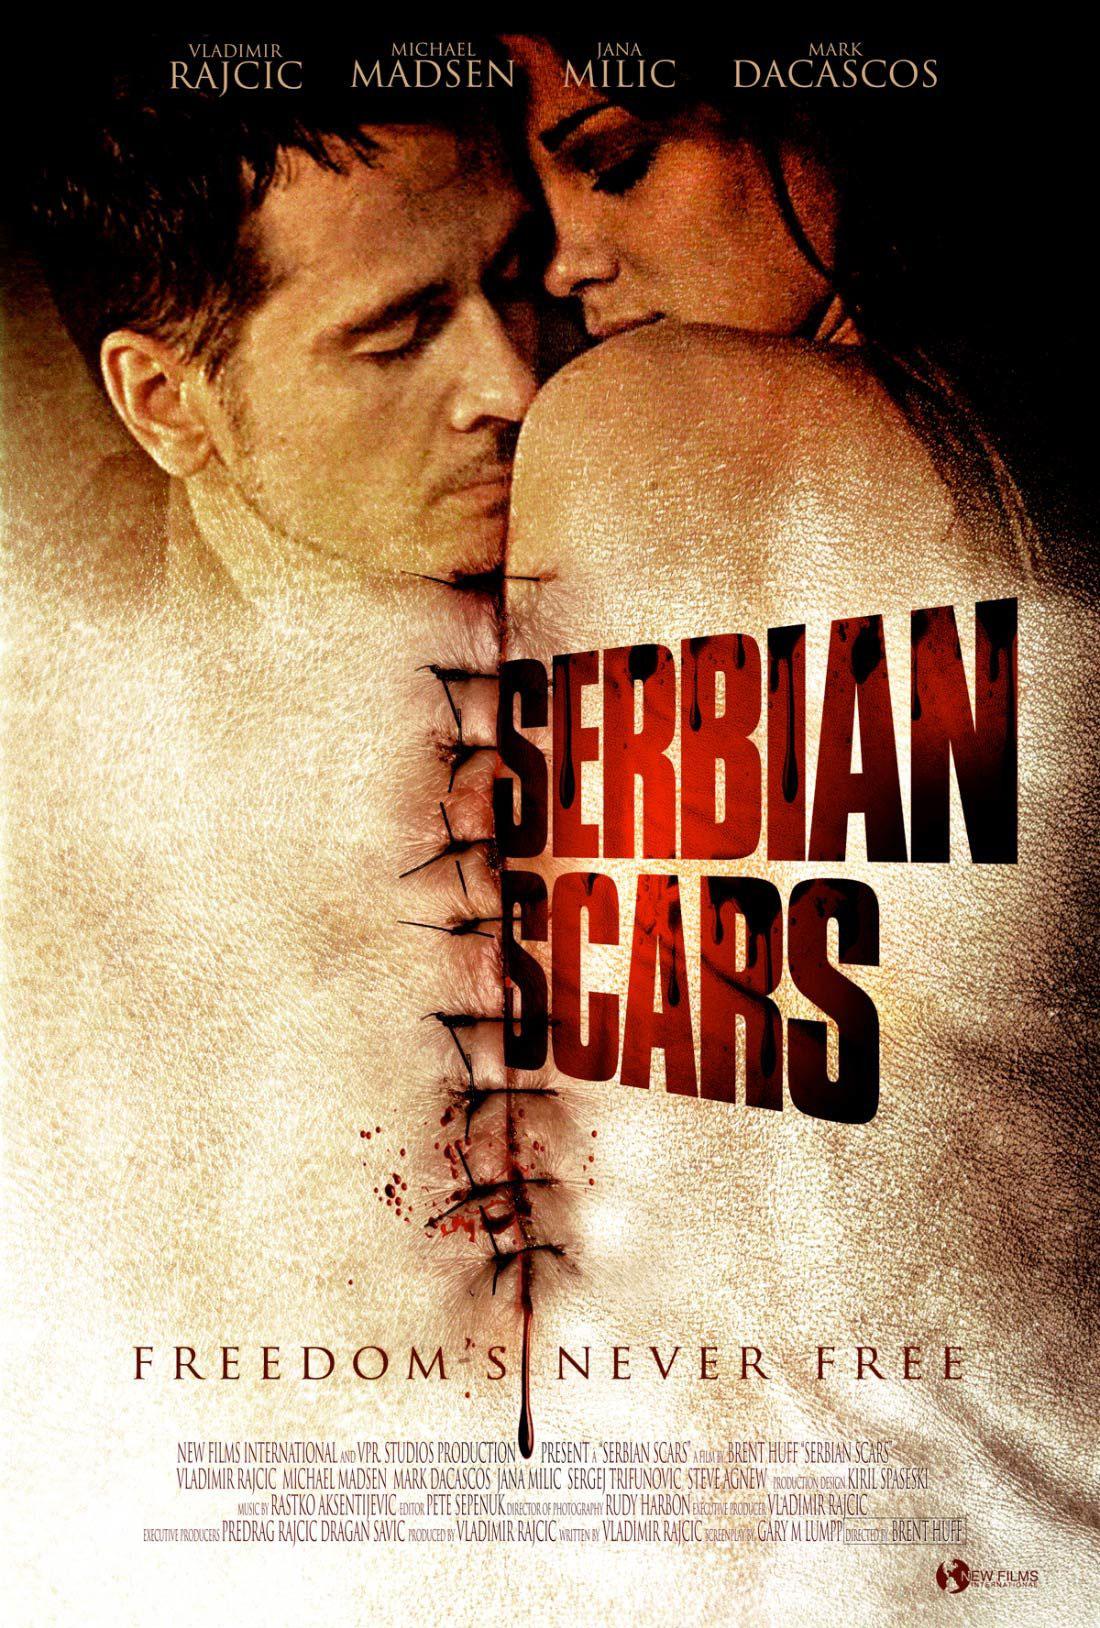 serbian-scars-01